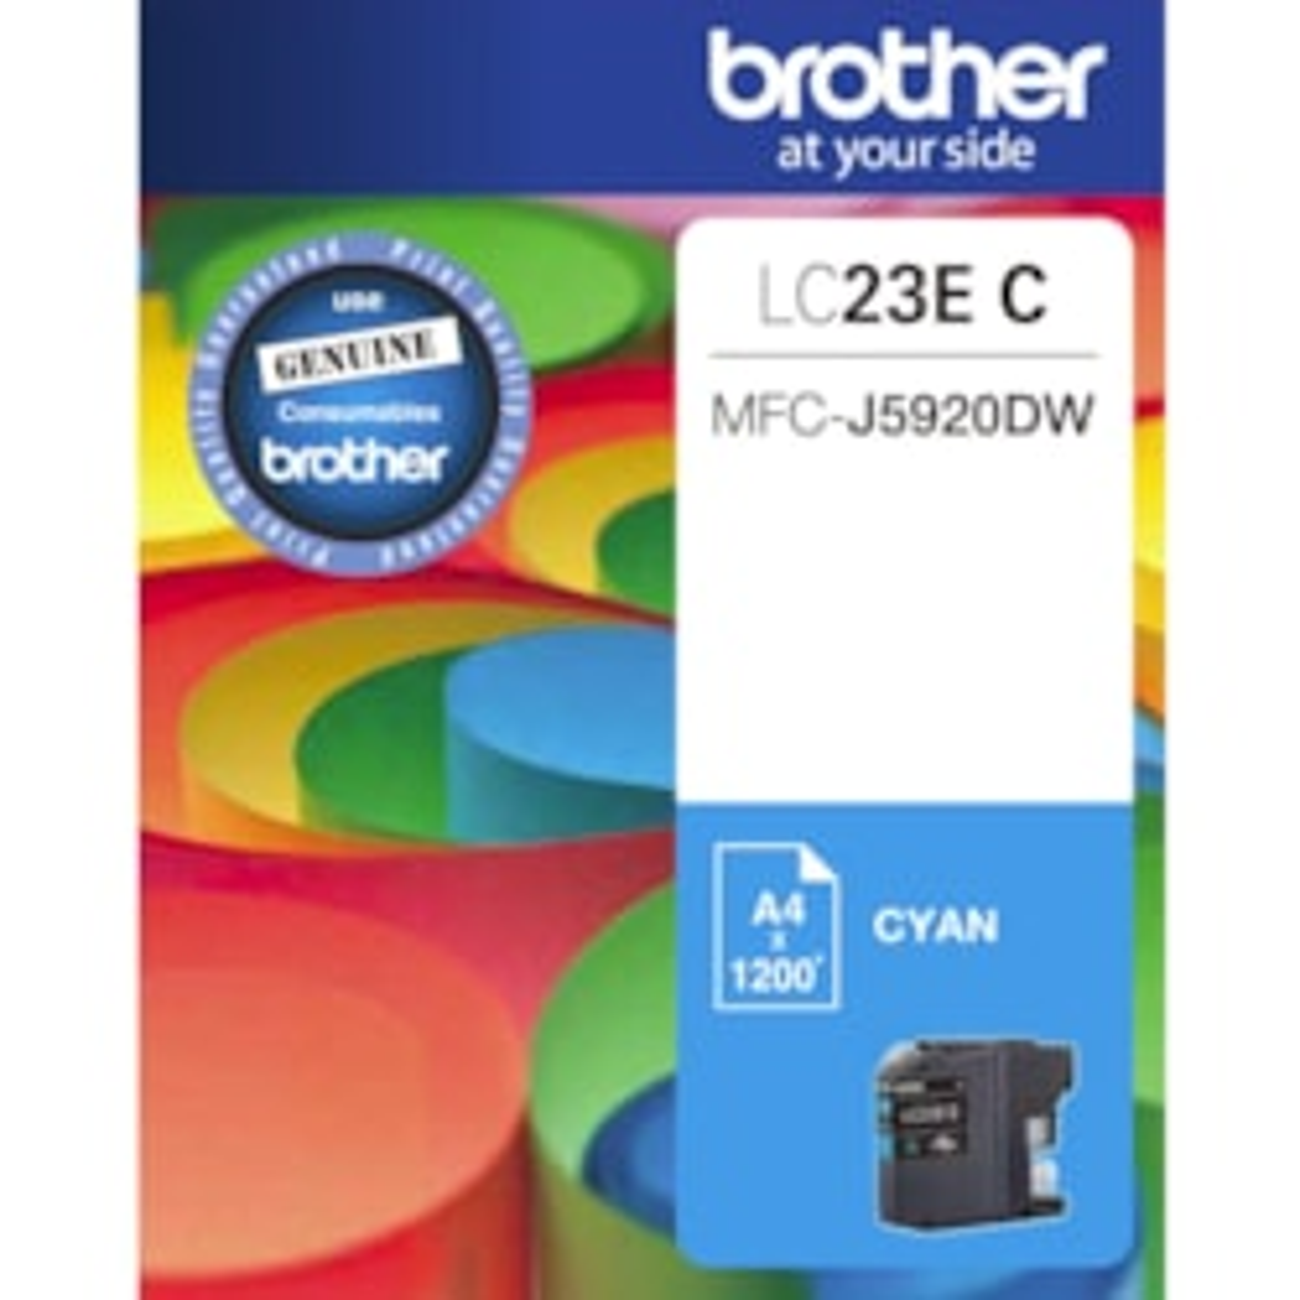 Brother LC23EC Original Ink Cartridge - Cyan